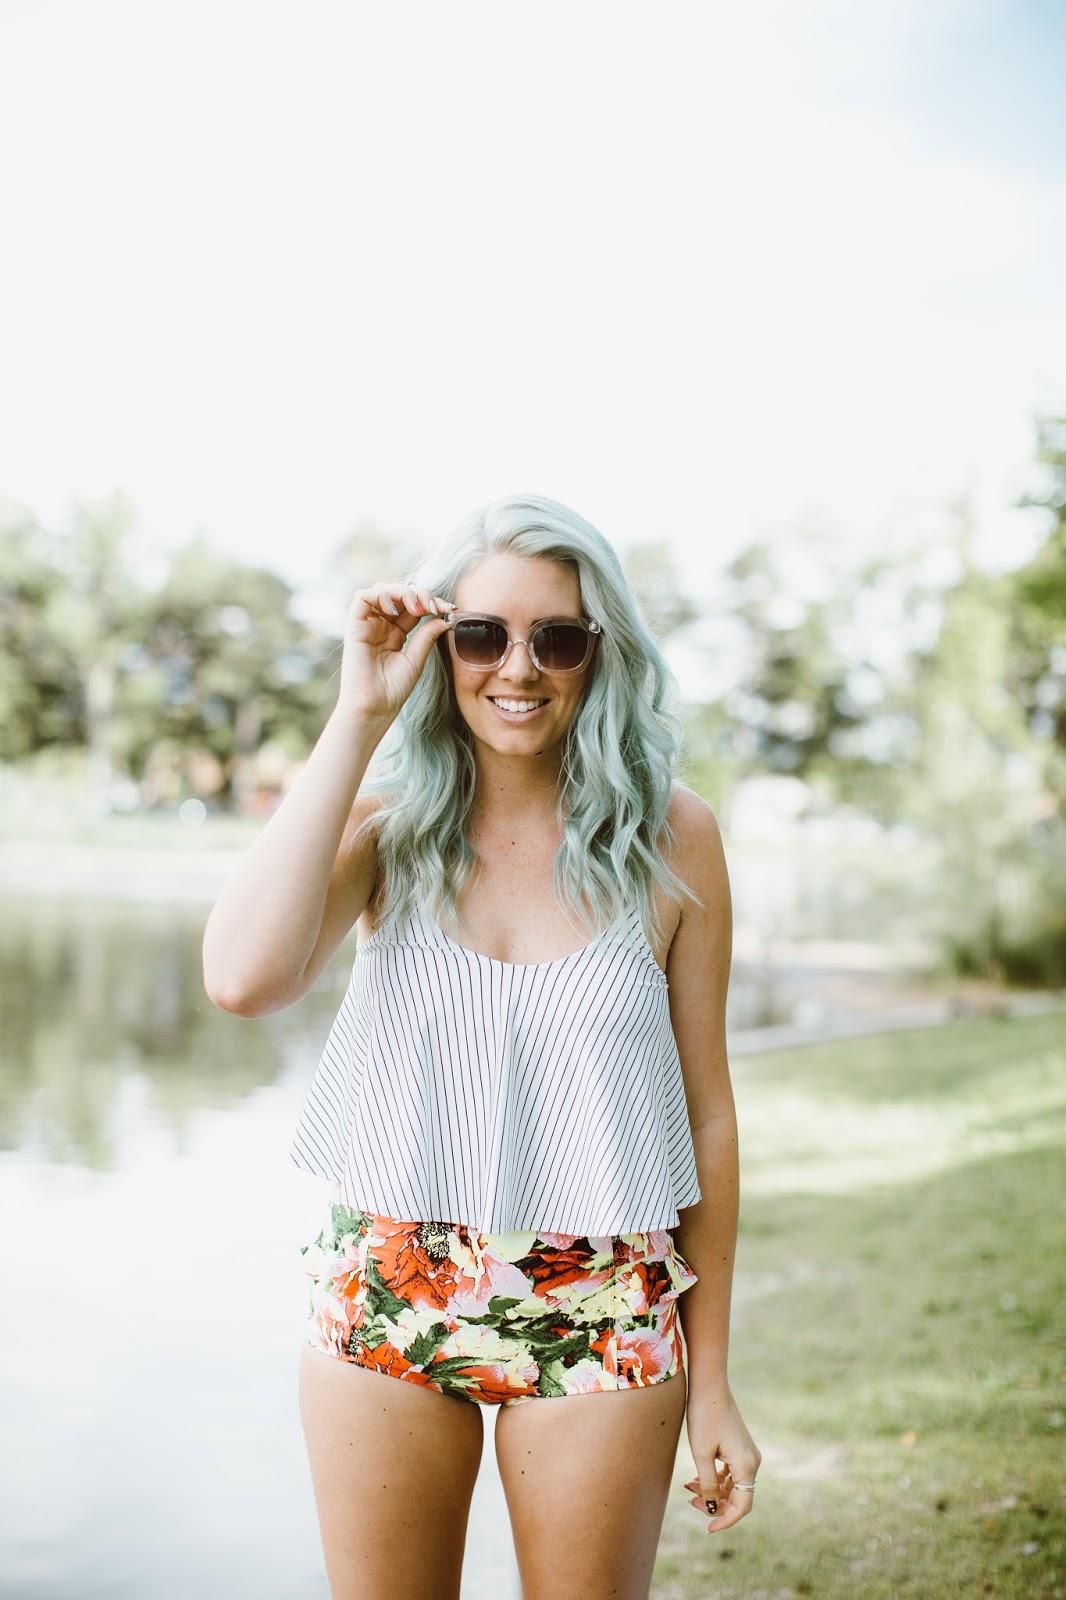 Mint Hair, Floral Swimsuit, Striped Swimsuit